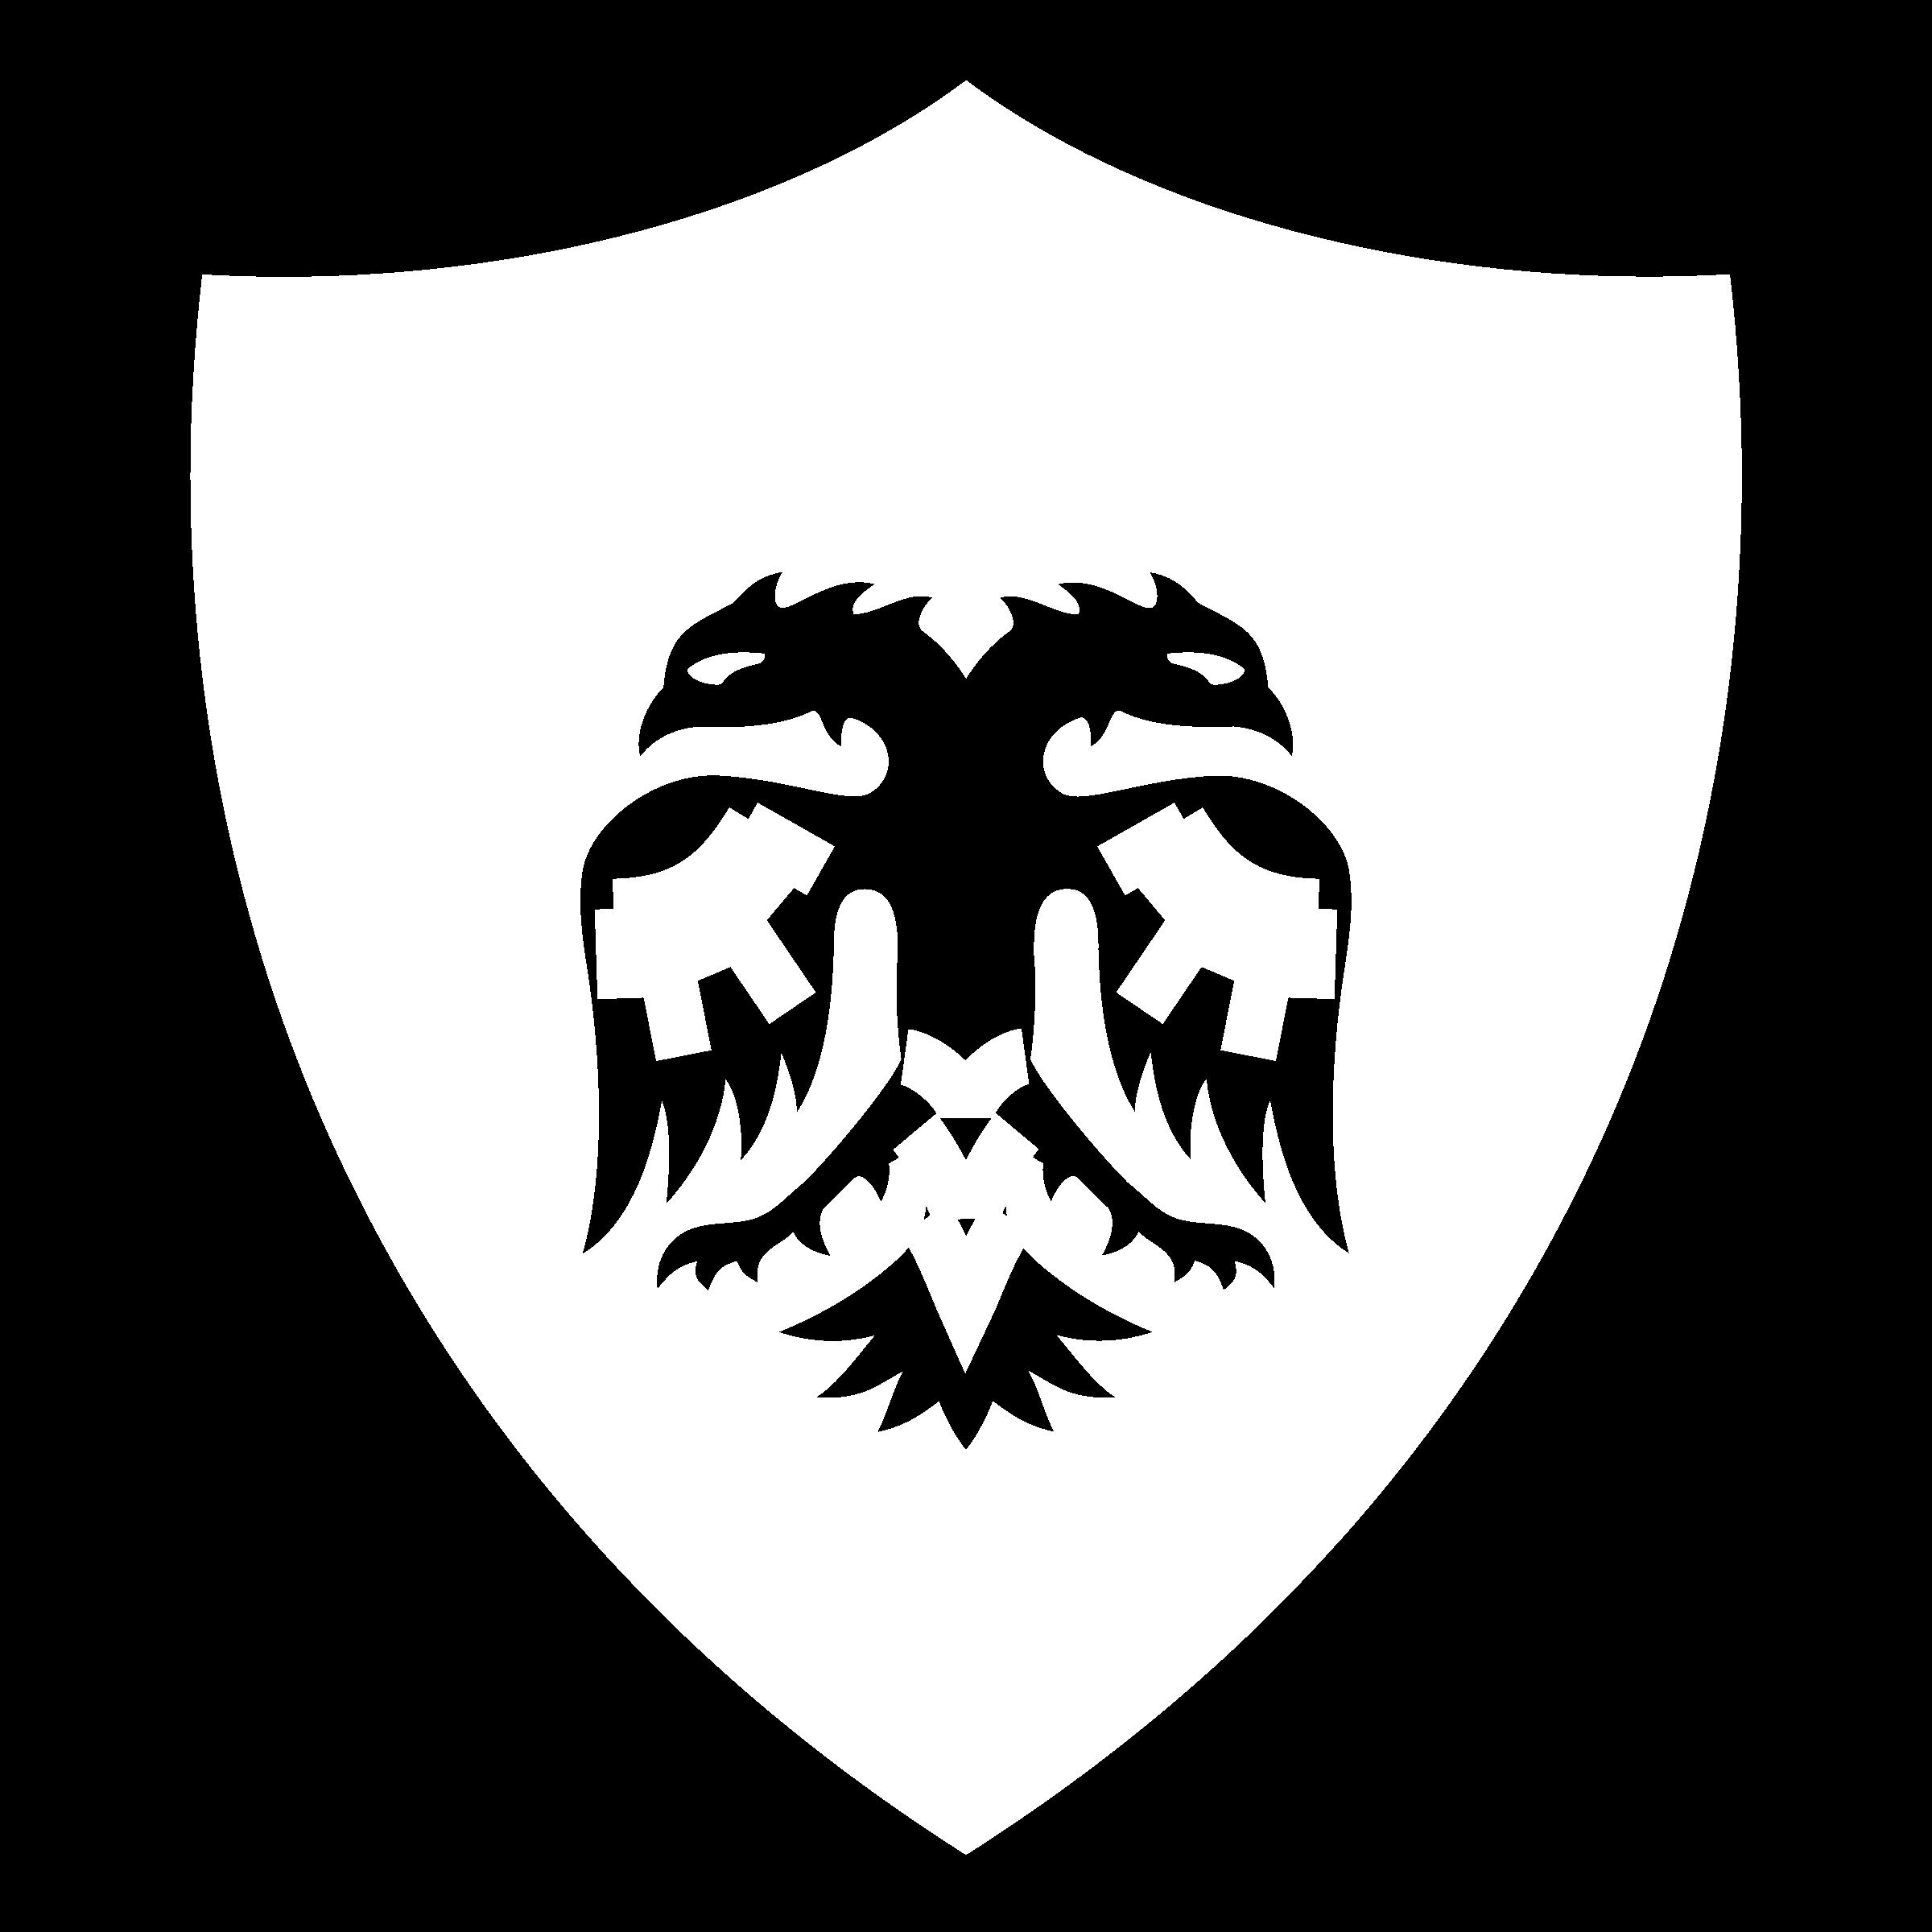 Erzurumspor Logo Png Transparent Svg Vector Freebie Supply